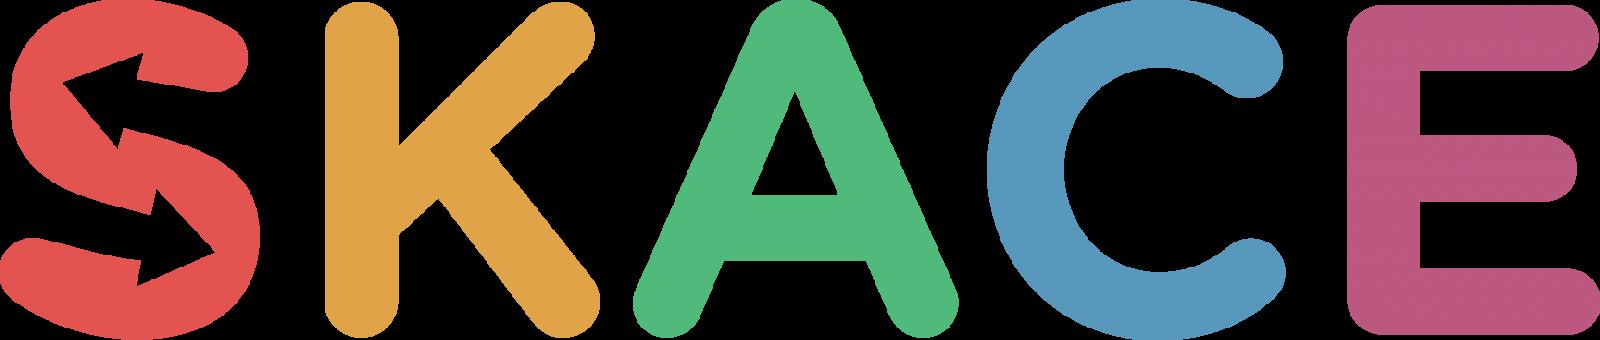 Startupbootcamp E-commerce startup Skace